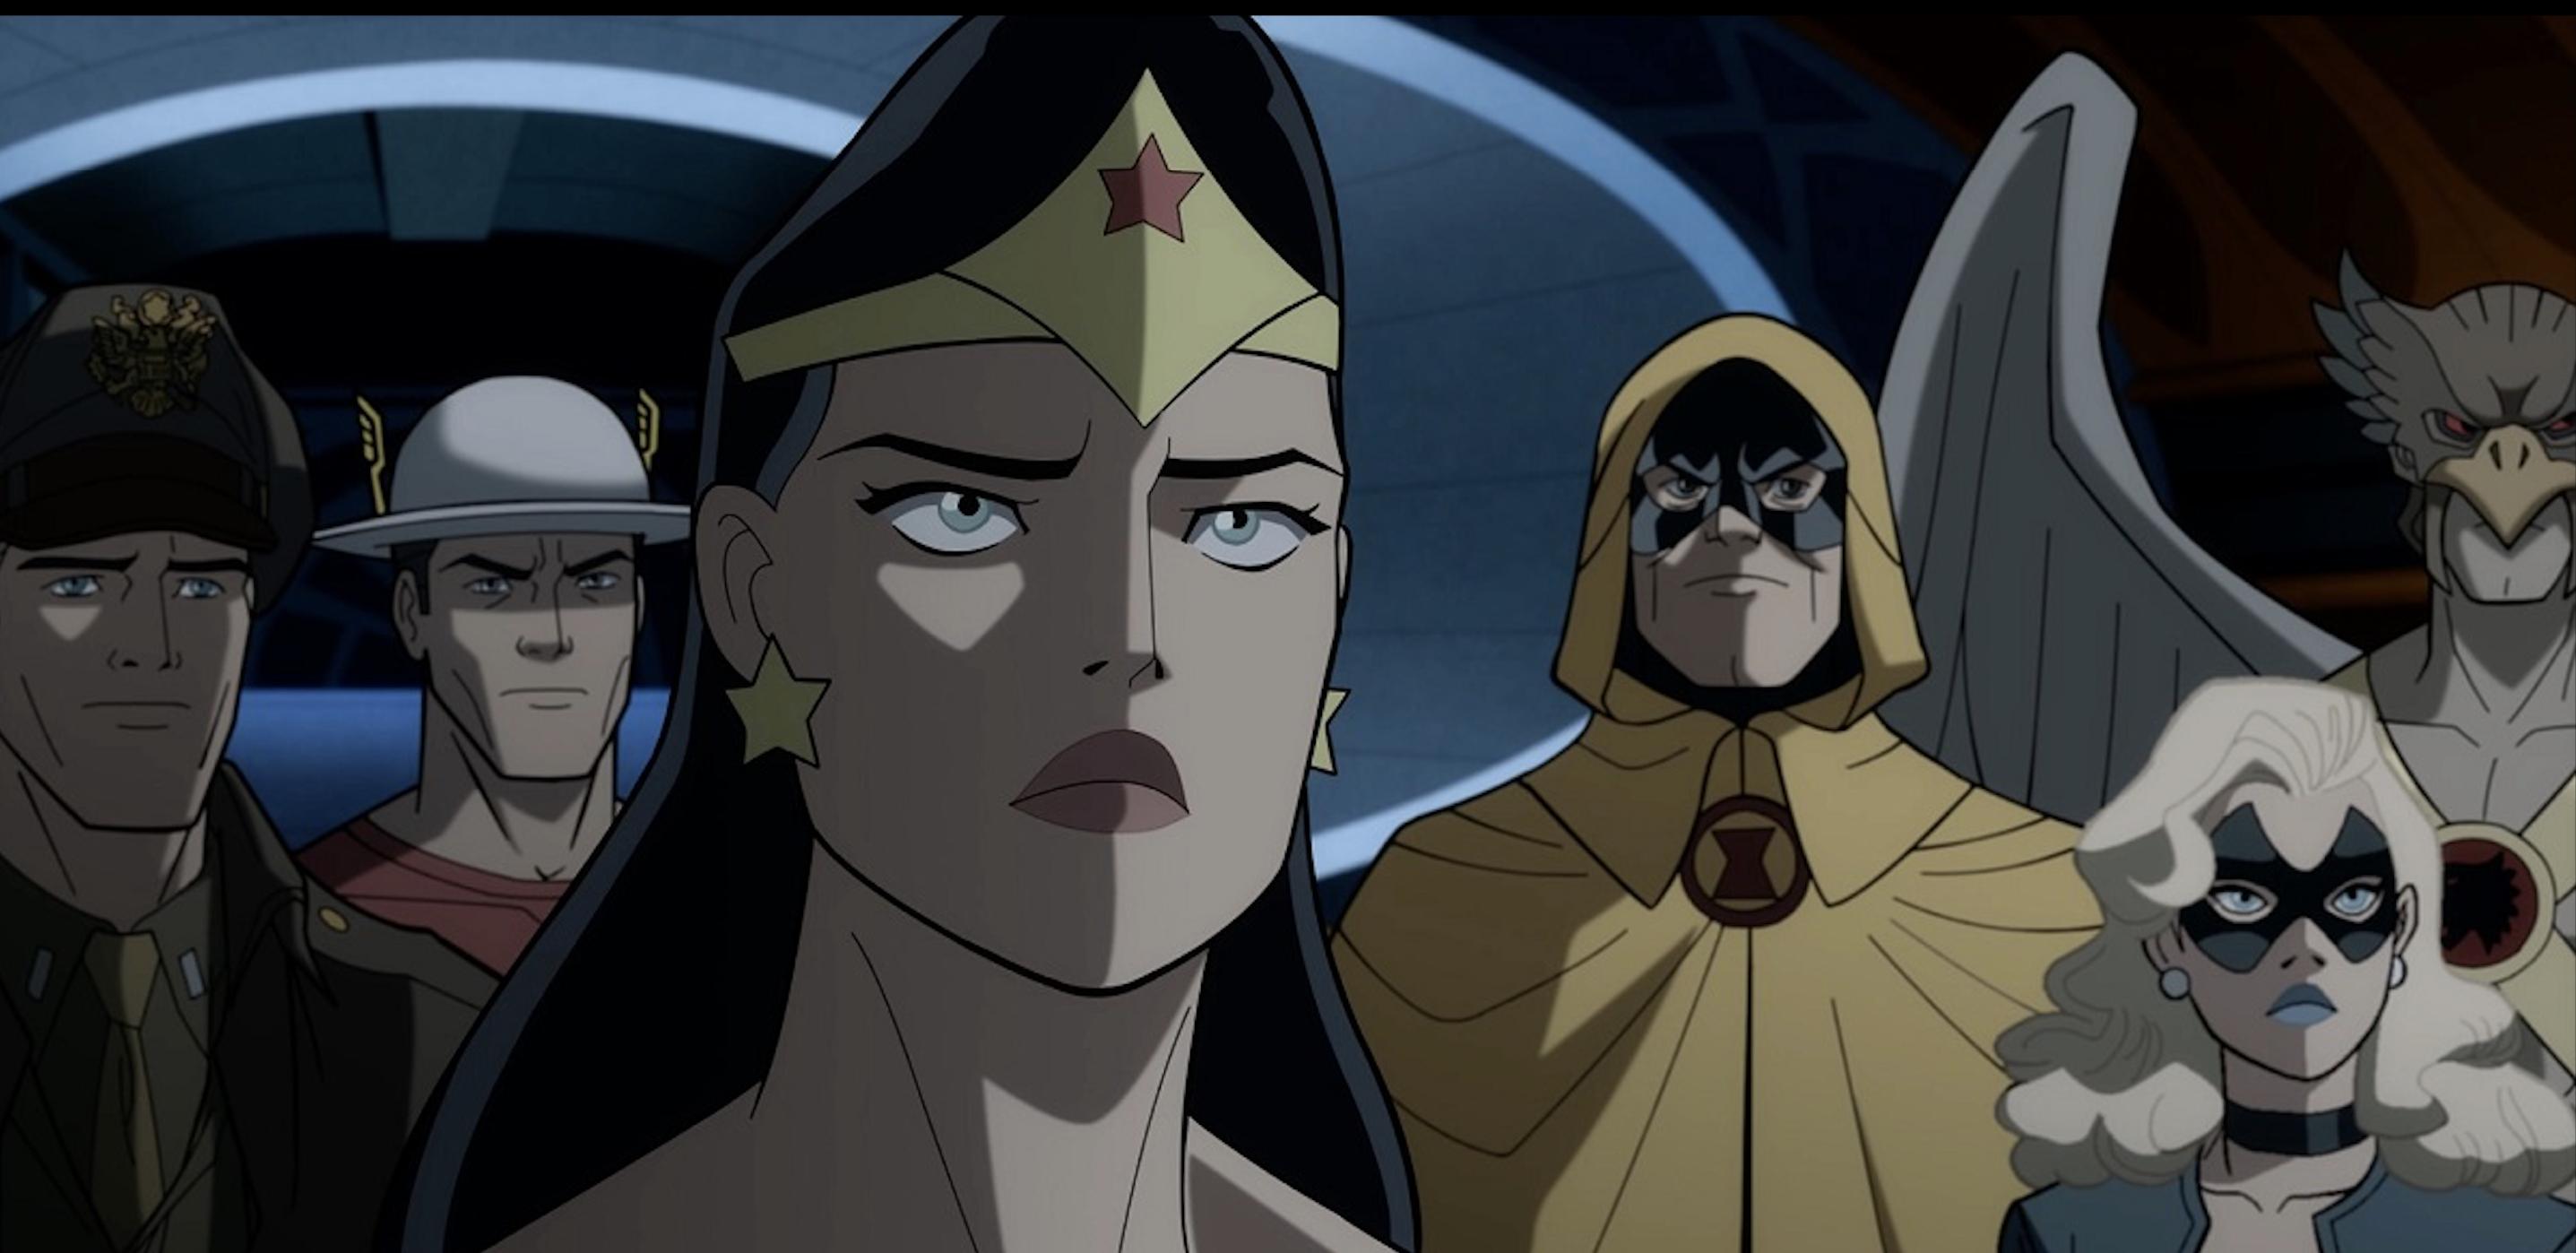 نقد و بررسی انیمیشن Justice Society: World War II